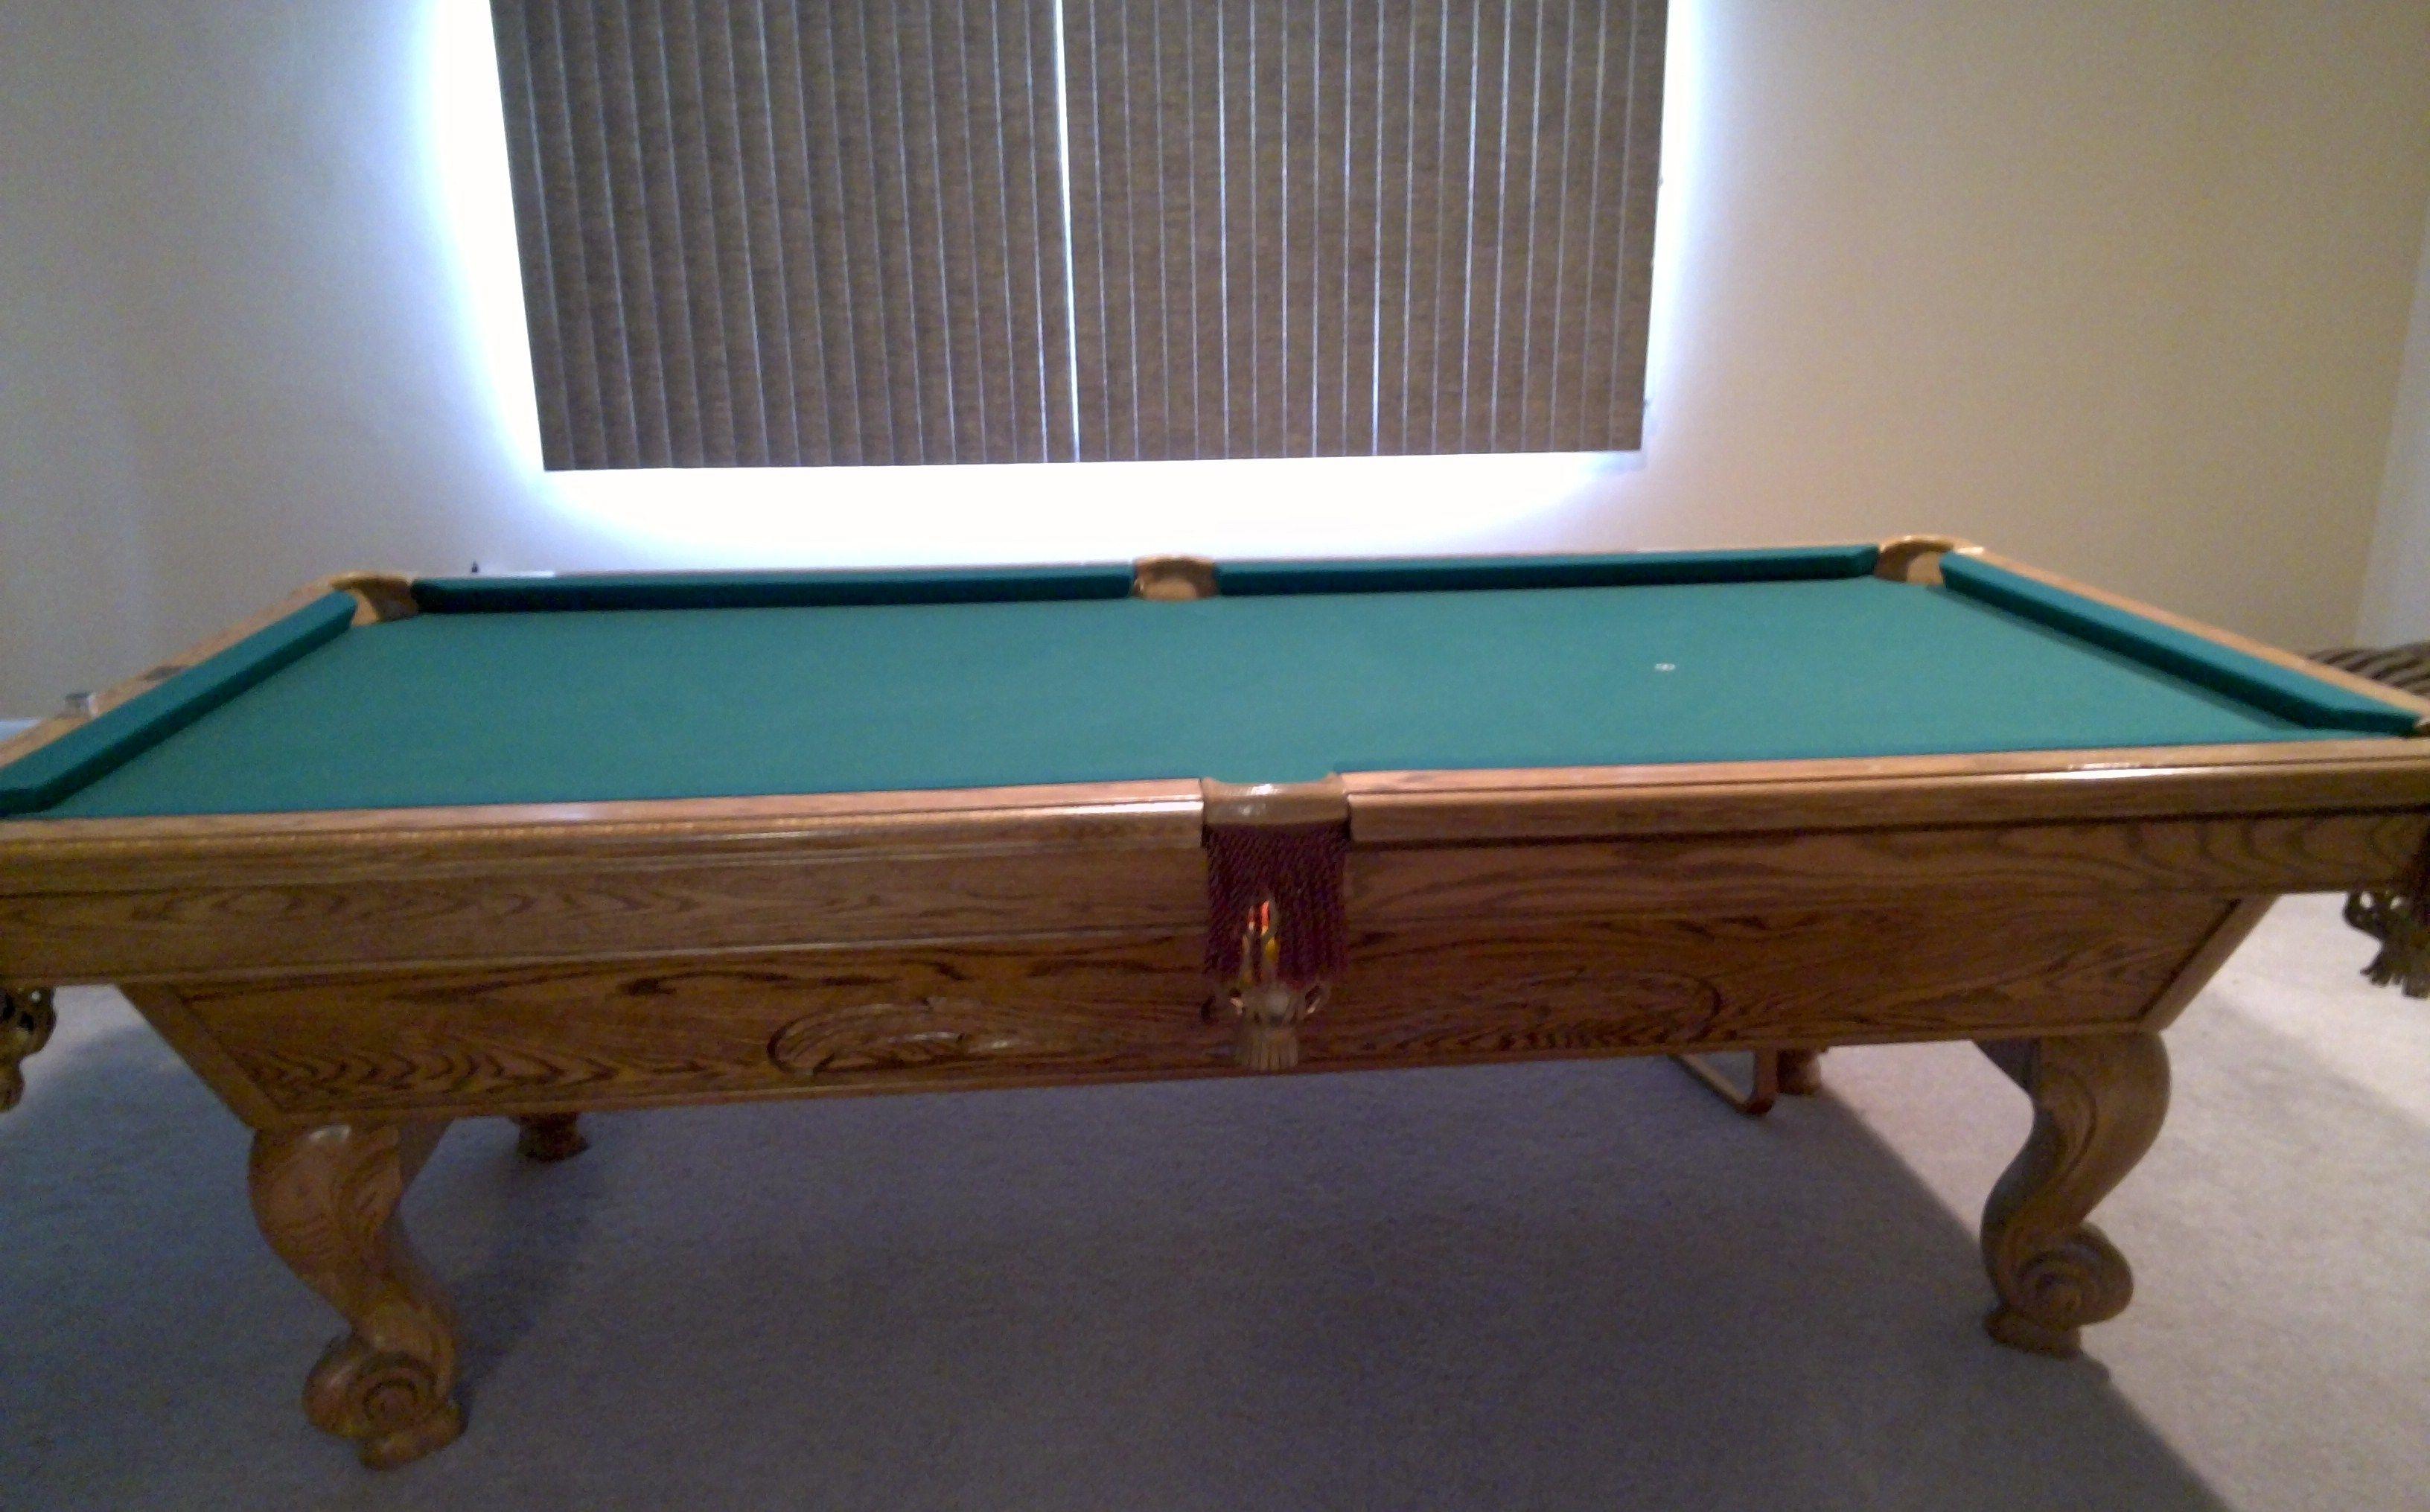 Brunswick Billiards Manchester Solid Wood Pool Table Sold Used - Brunswick manchester pool table